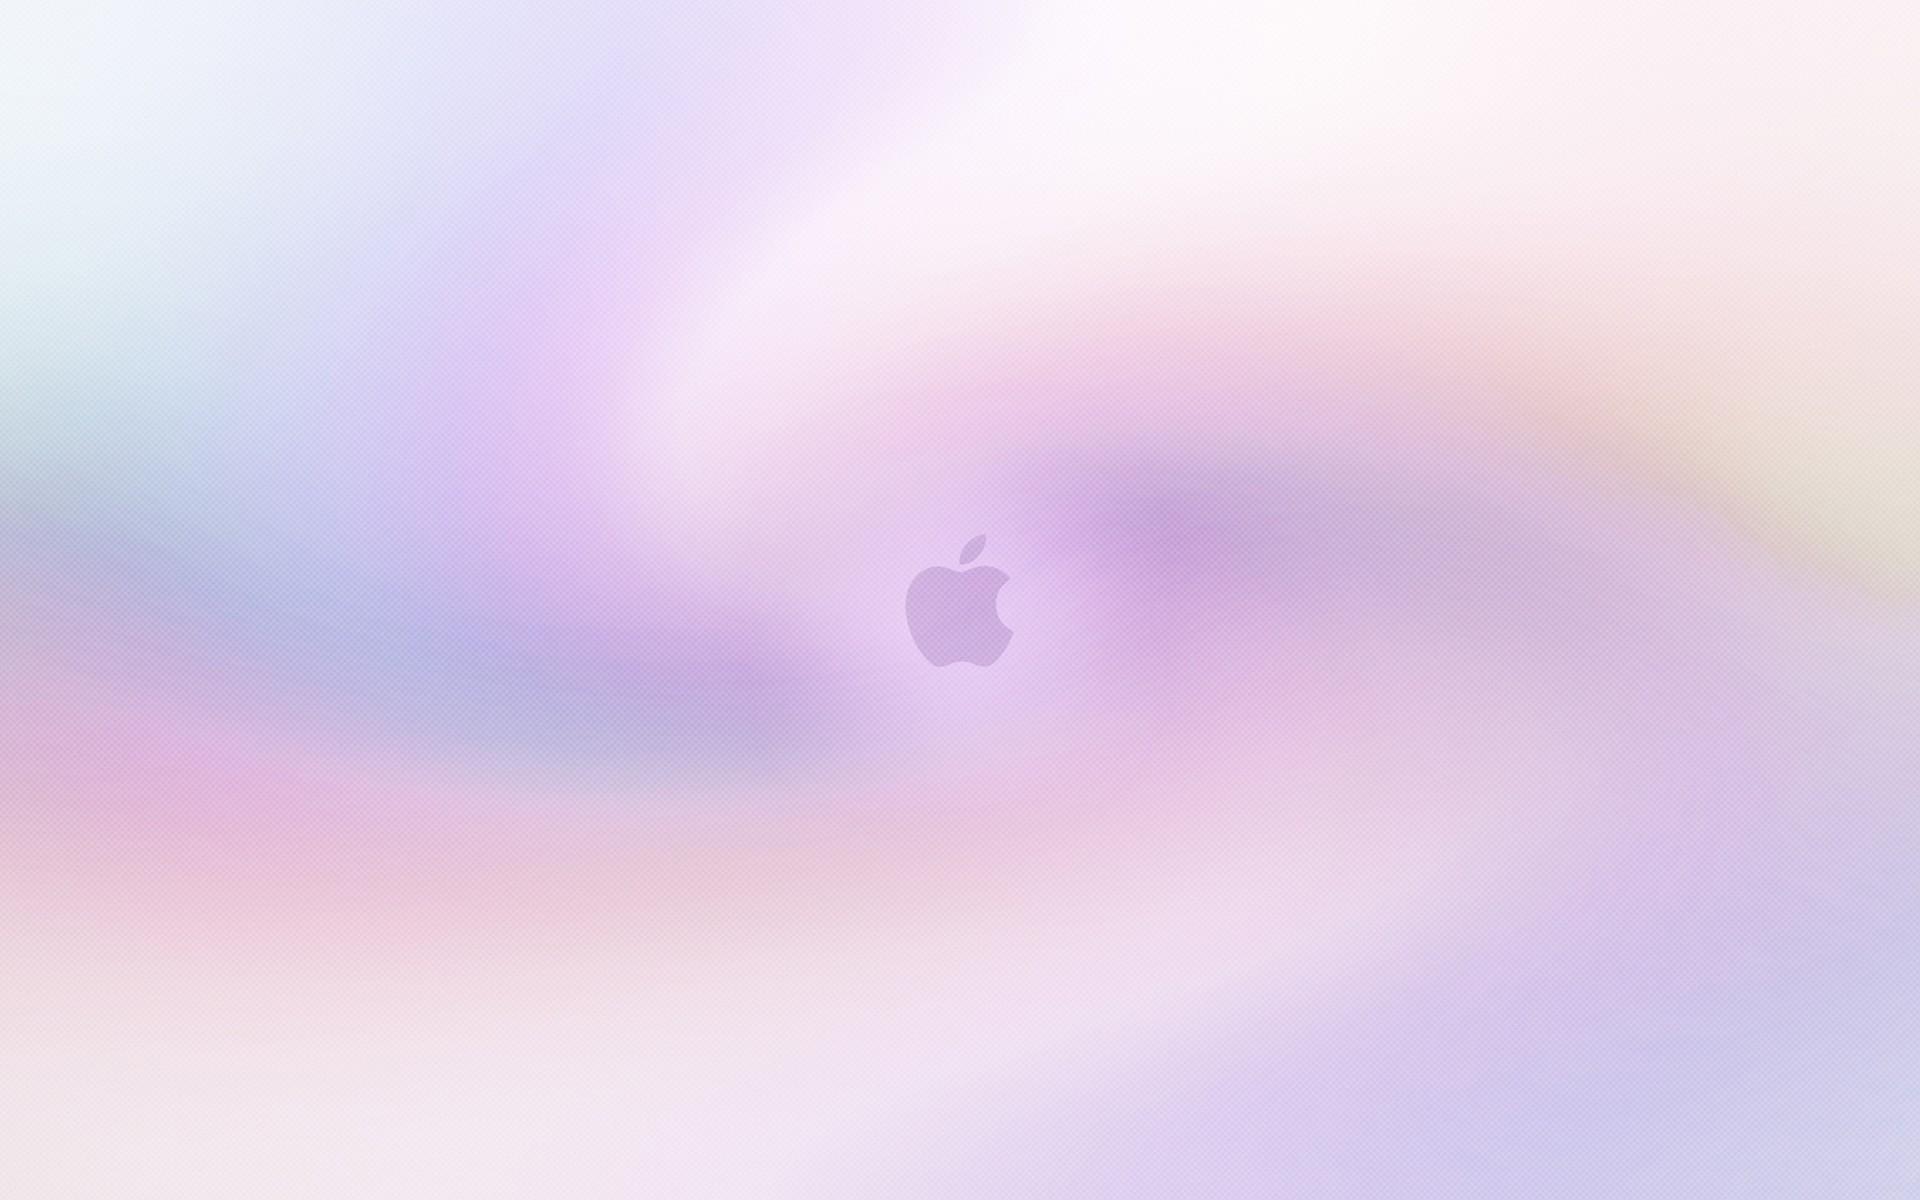 Latar Belakang Warna Pastel Wallpaper - Download ke ponsel